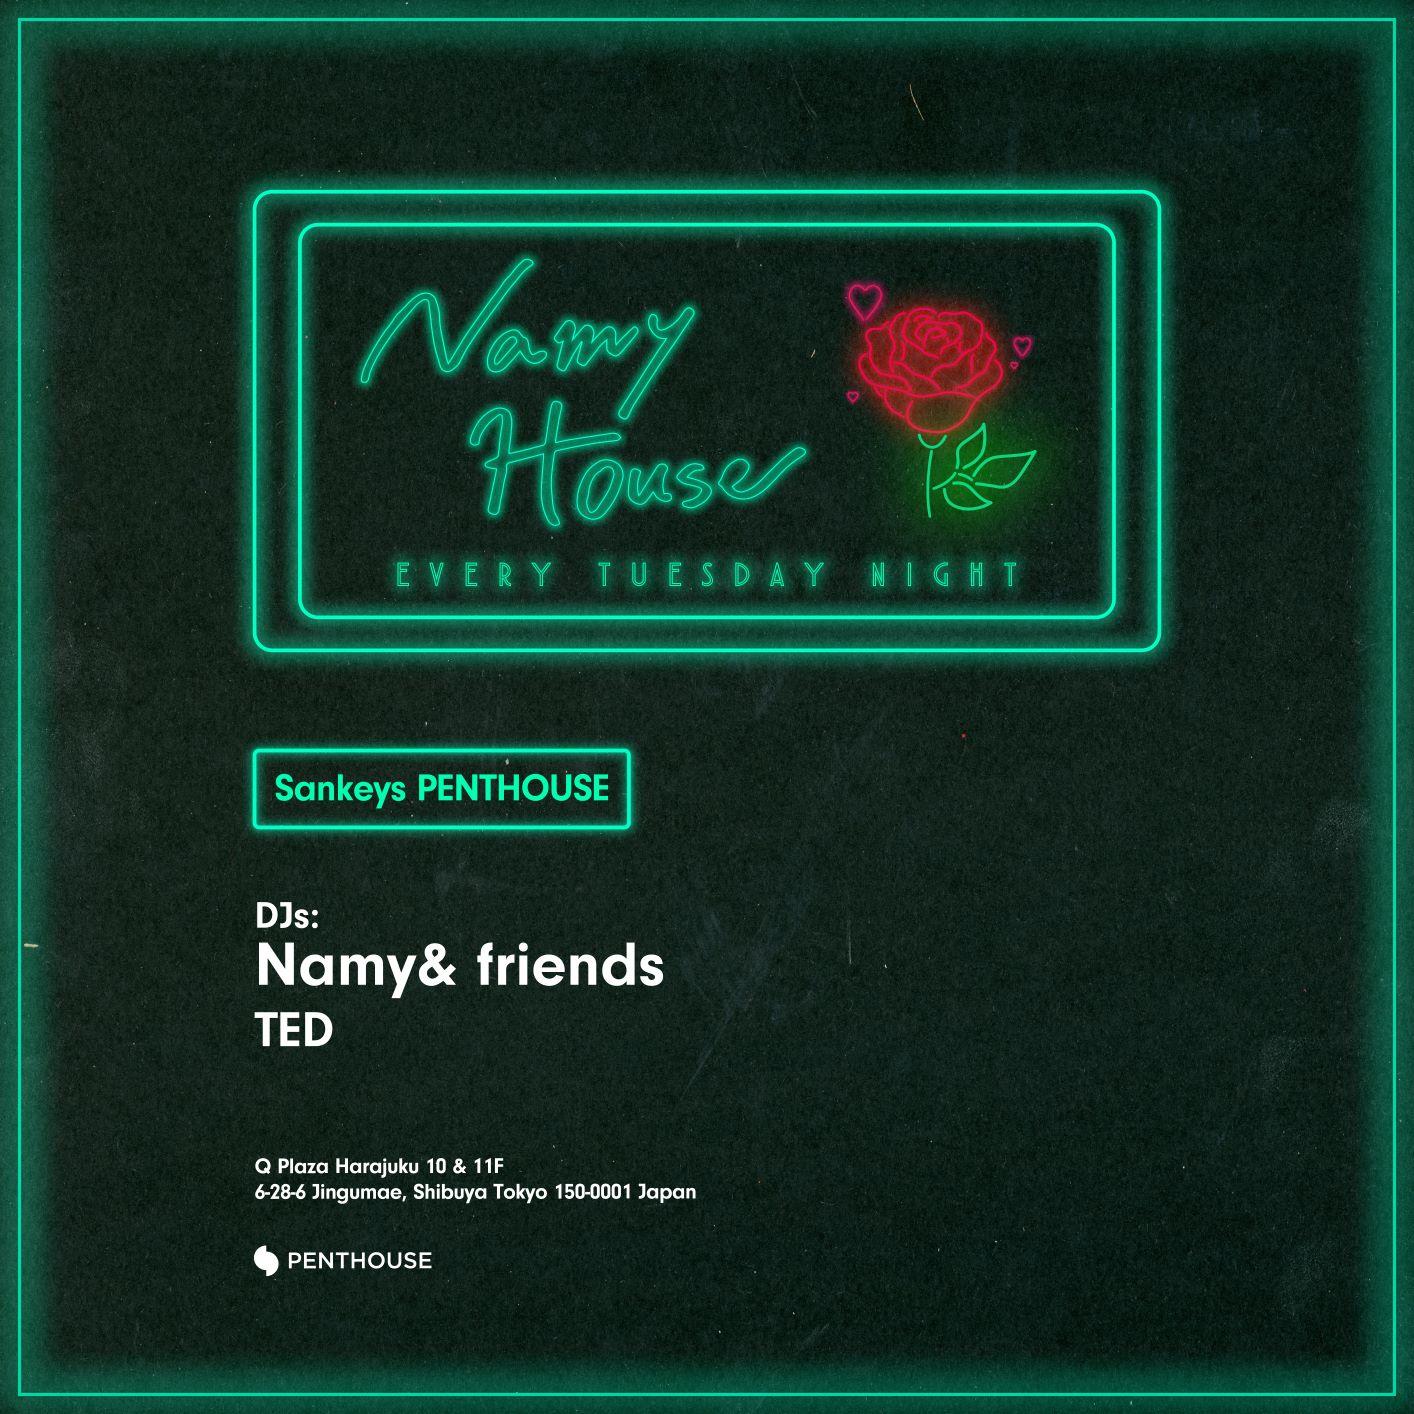 Namy House